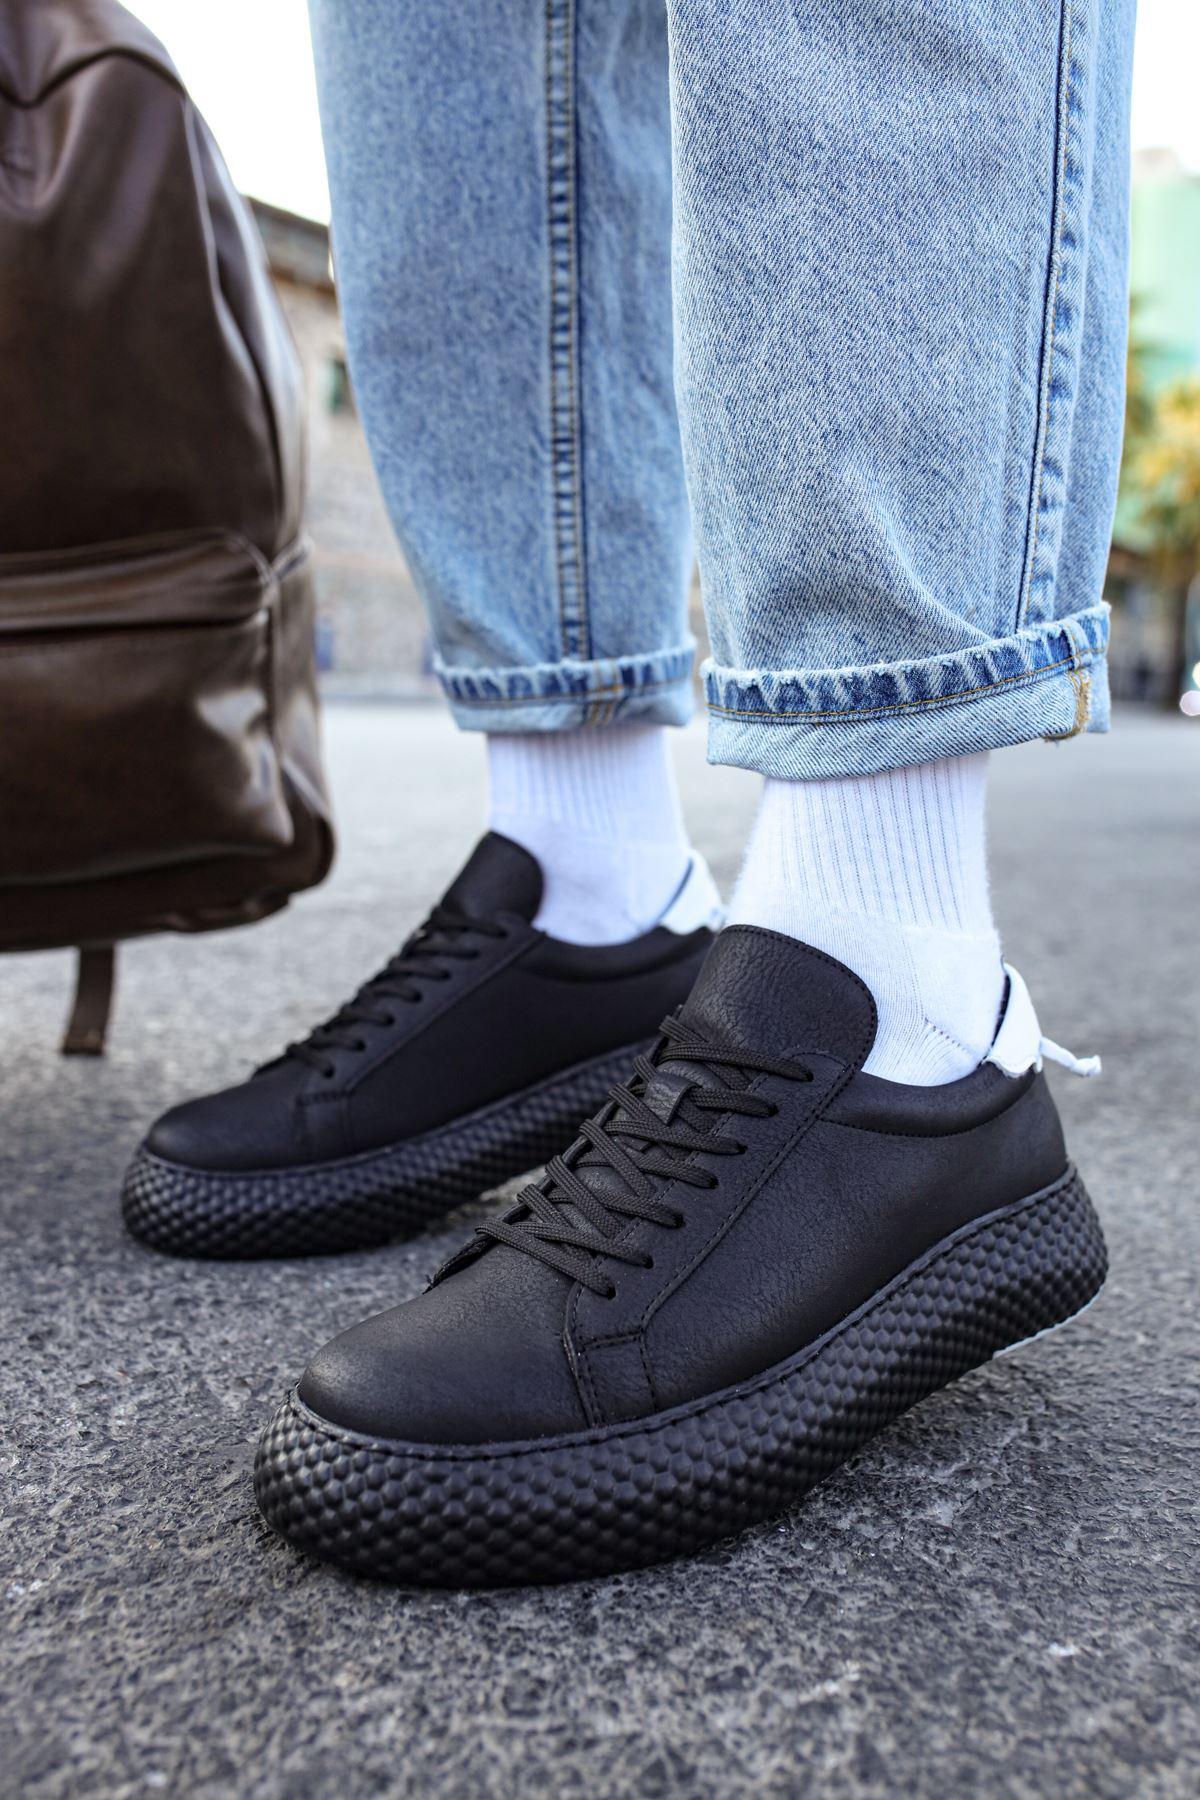 Chekich CH107 GST Erkek Ayakkabı SİYAH/BEYAZ